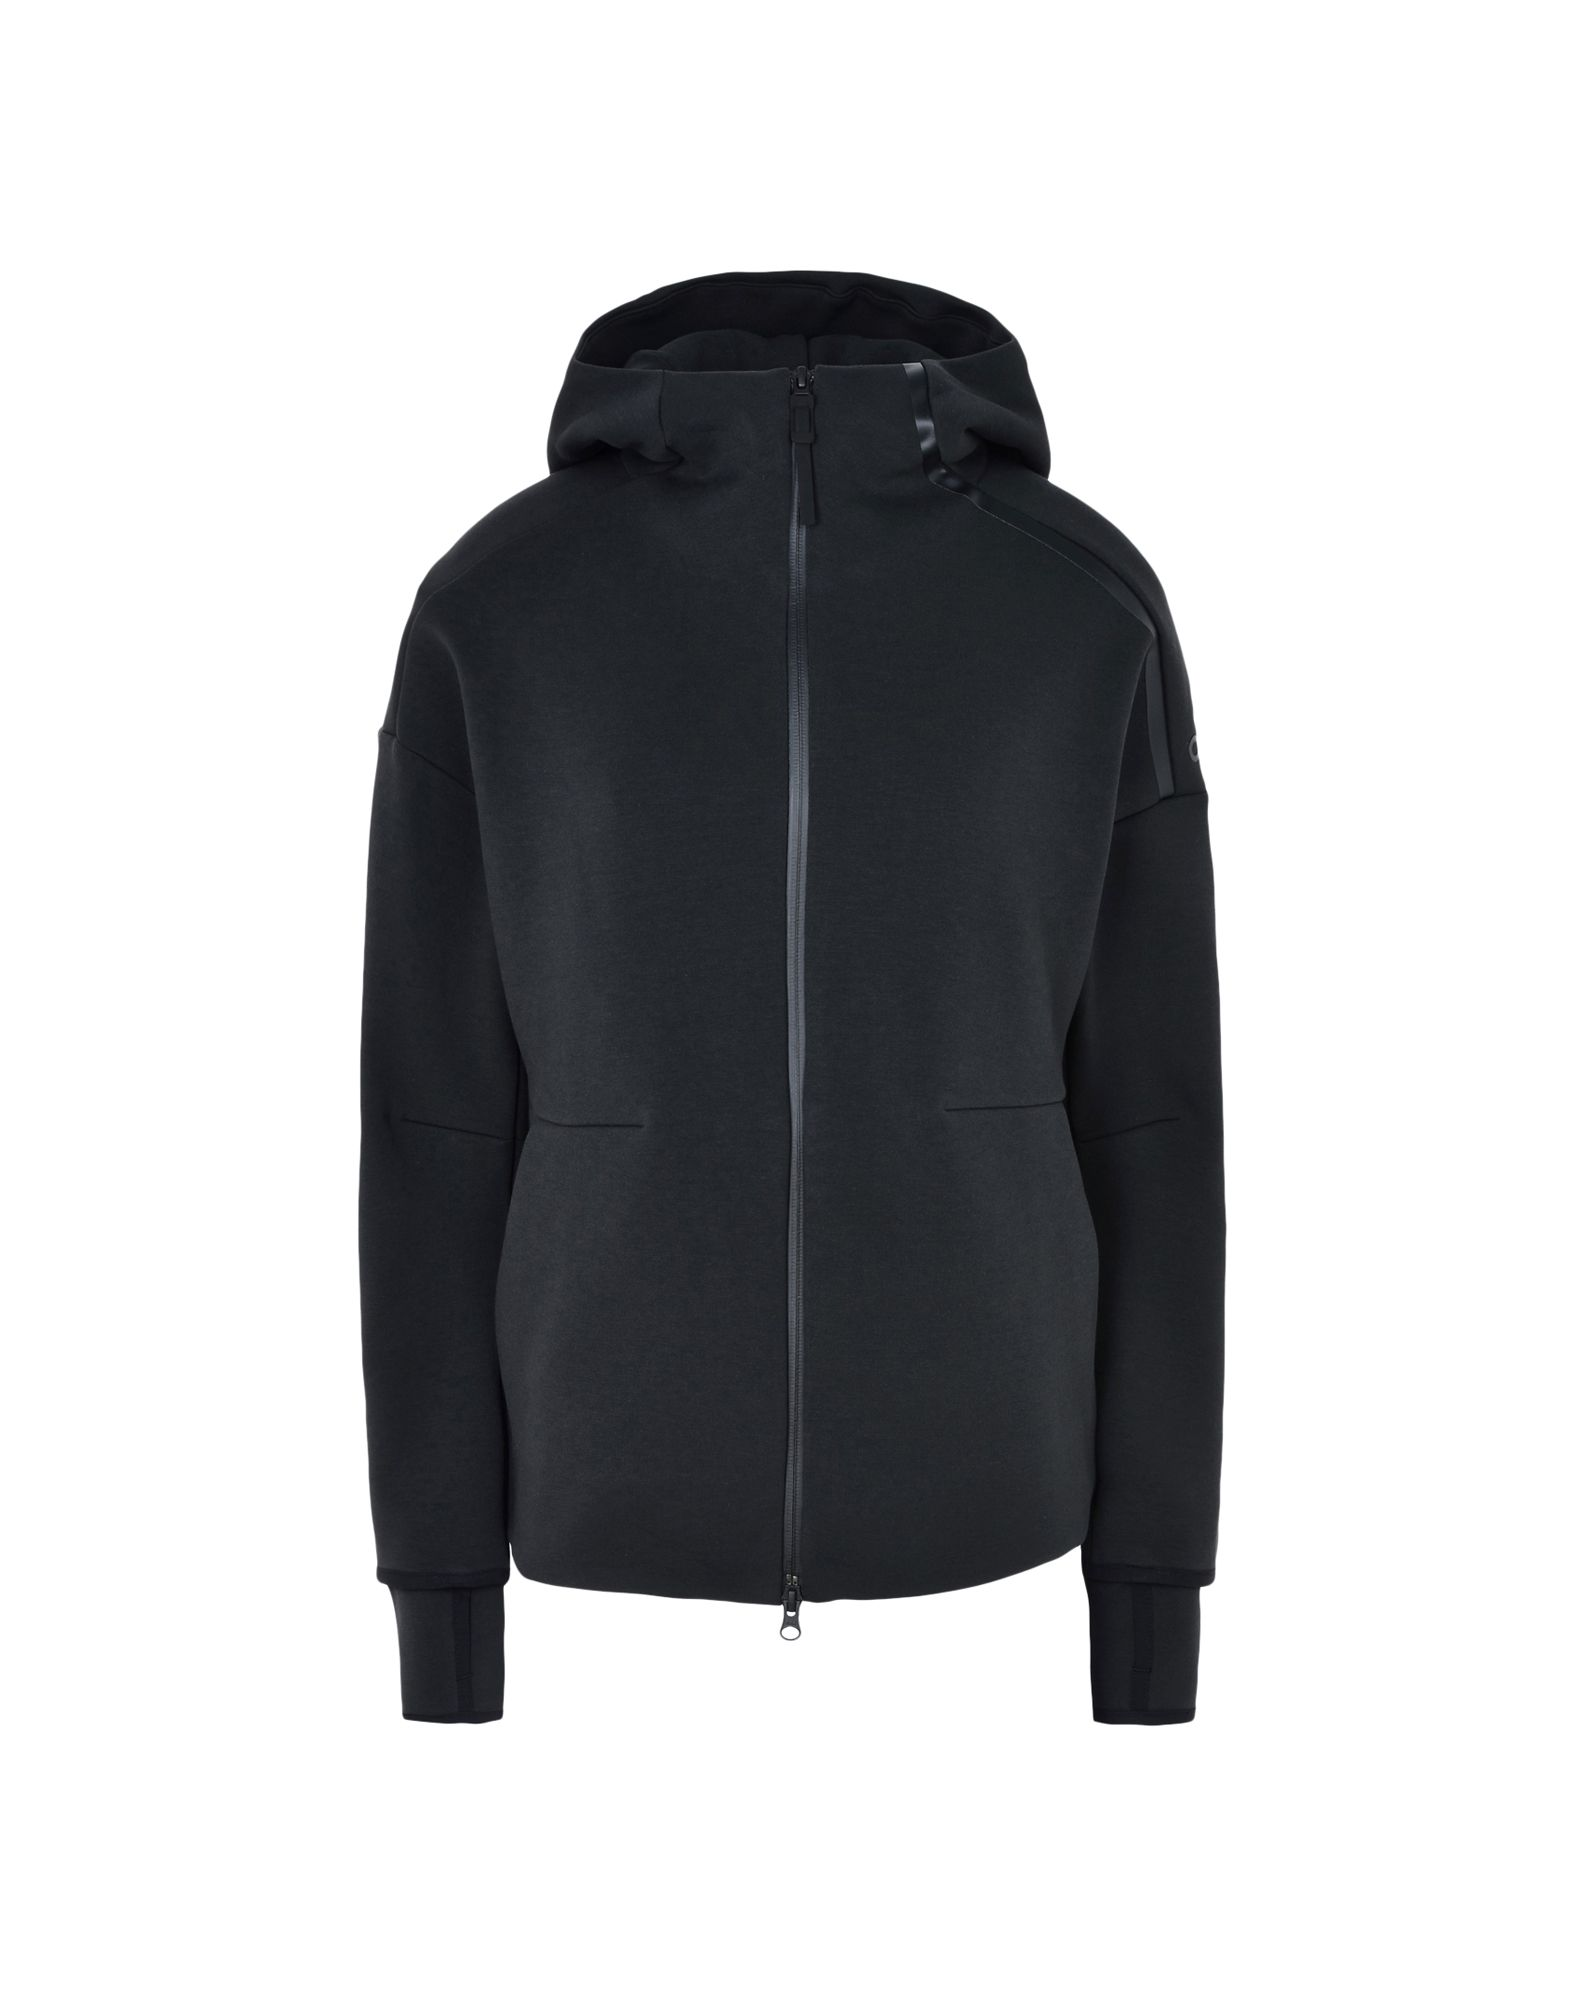 ce7c96727361d9 Adidas Donna - Tute, Scarpe, Top e Costumi da bagno - Shop Online at ...